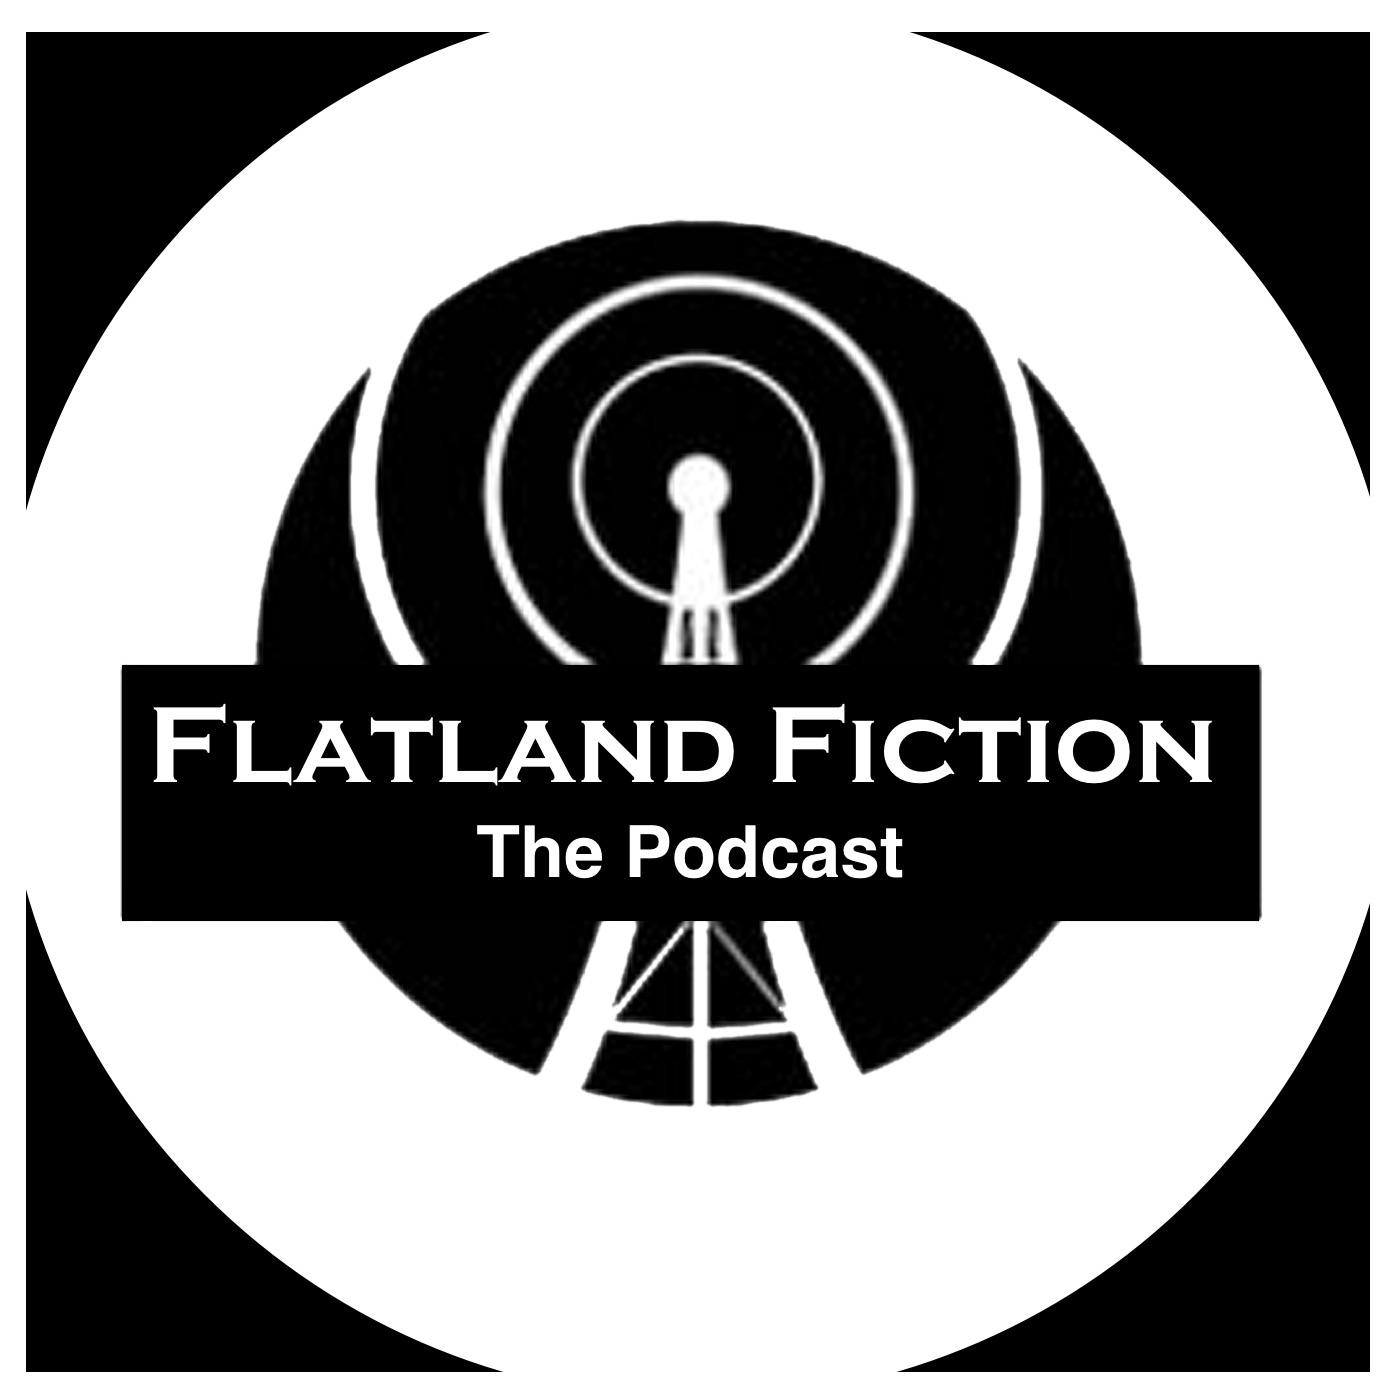 Flatland Fiction Podcast | Listen via Stitcher for Podcasts